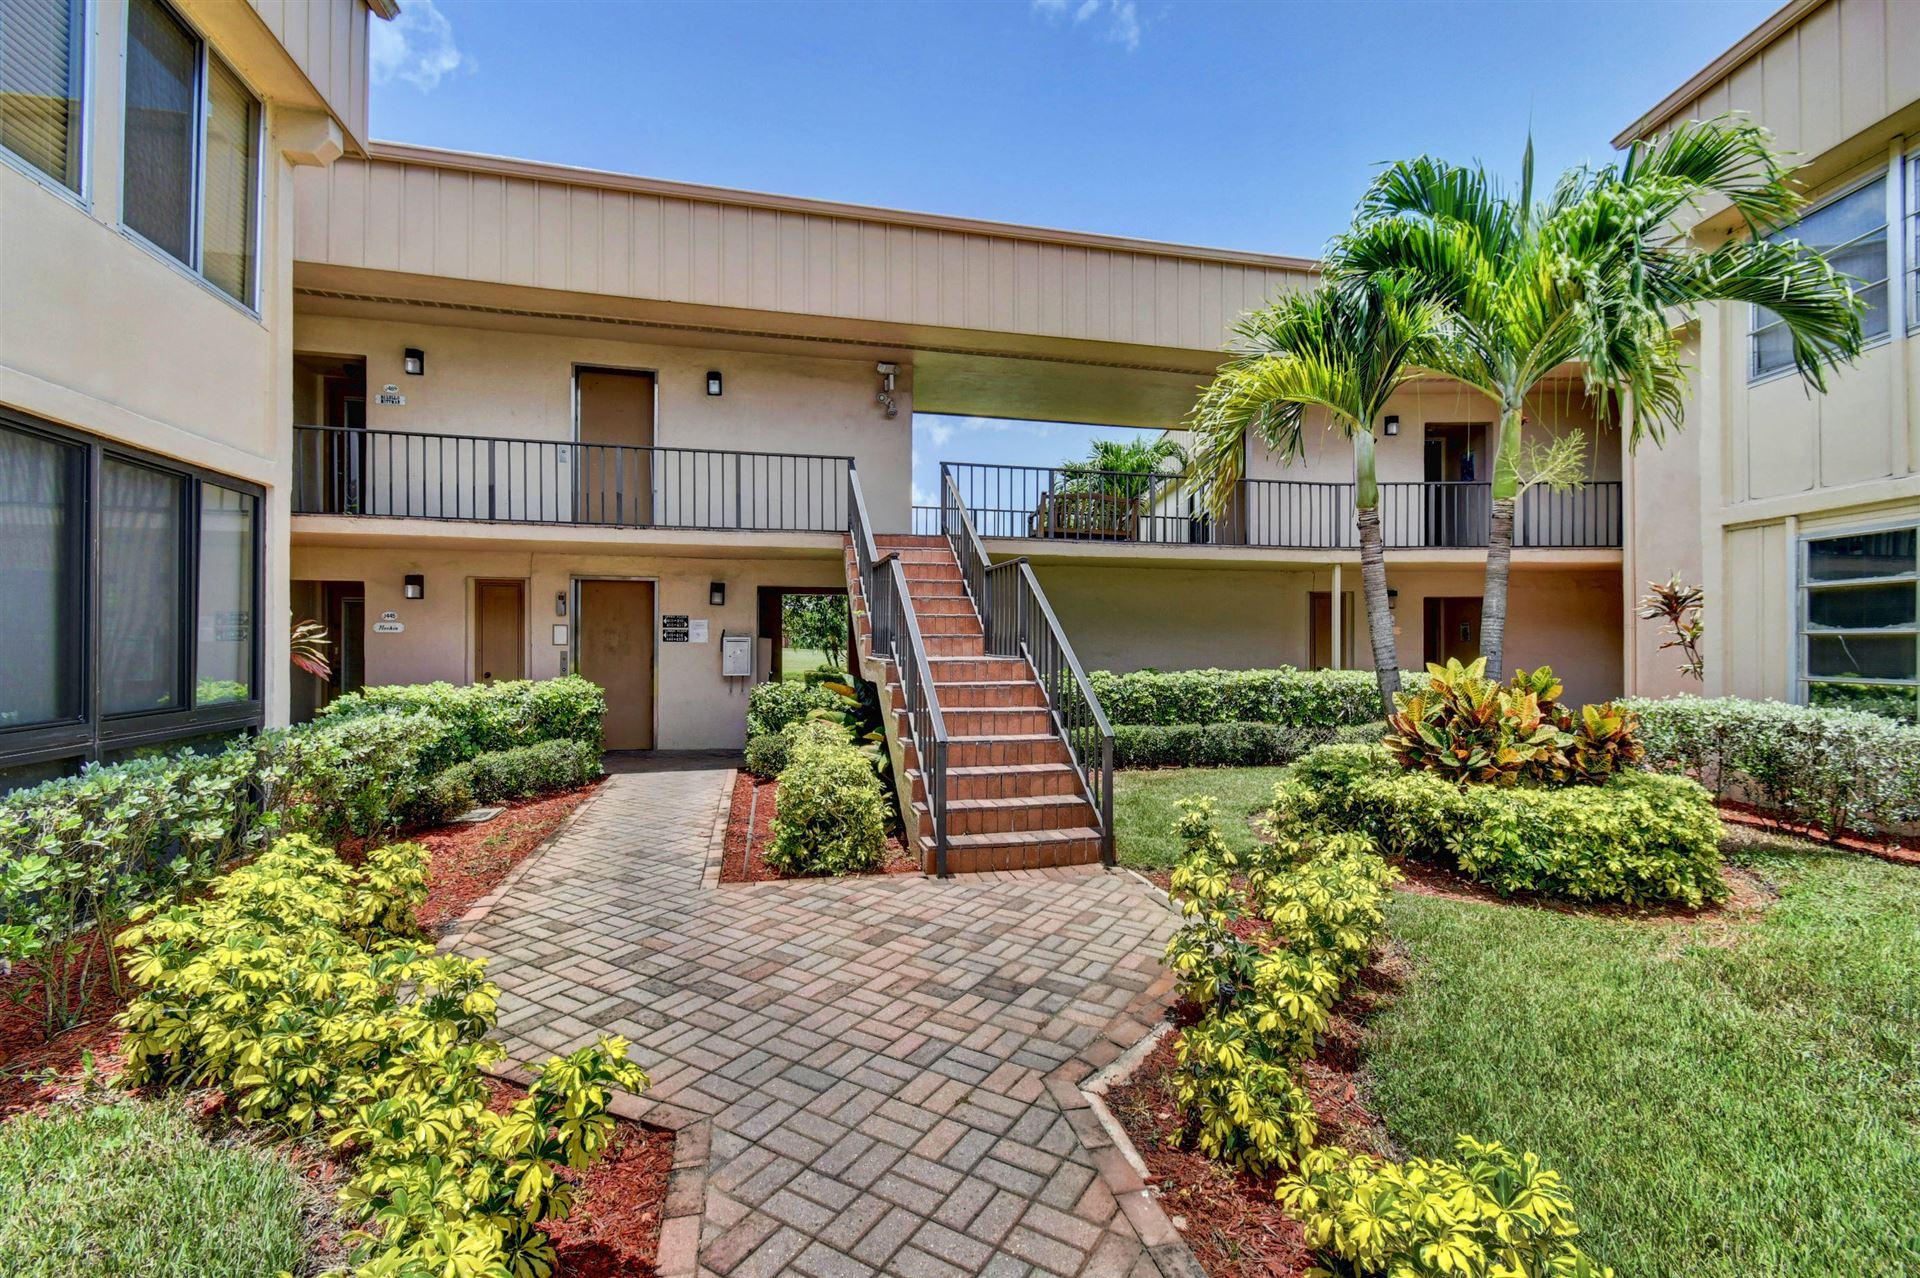 445 Piedmont J, Delray Beach, FL 33484 - #: RX-10635766